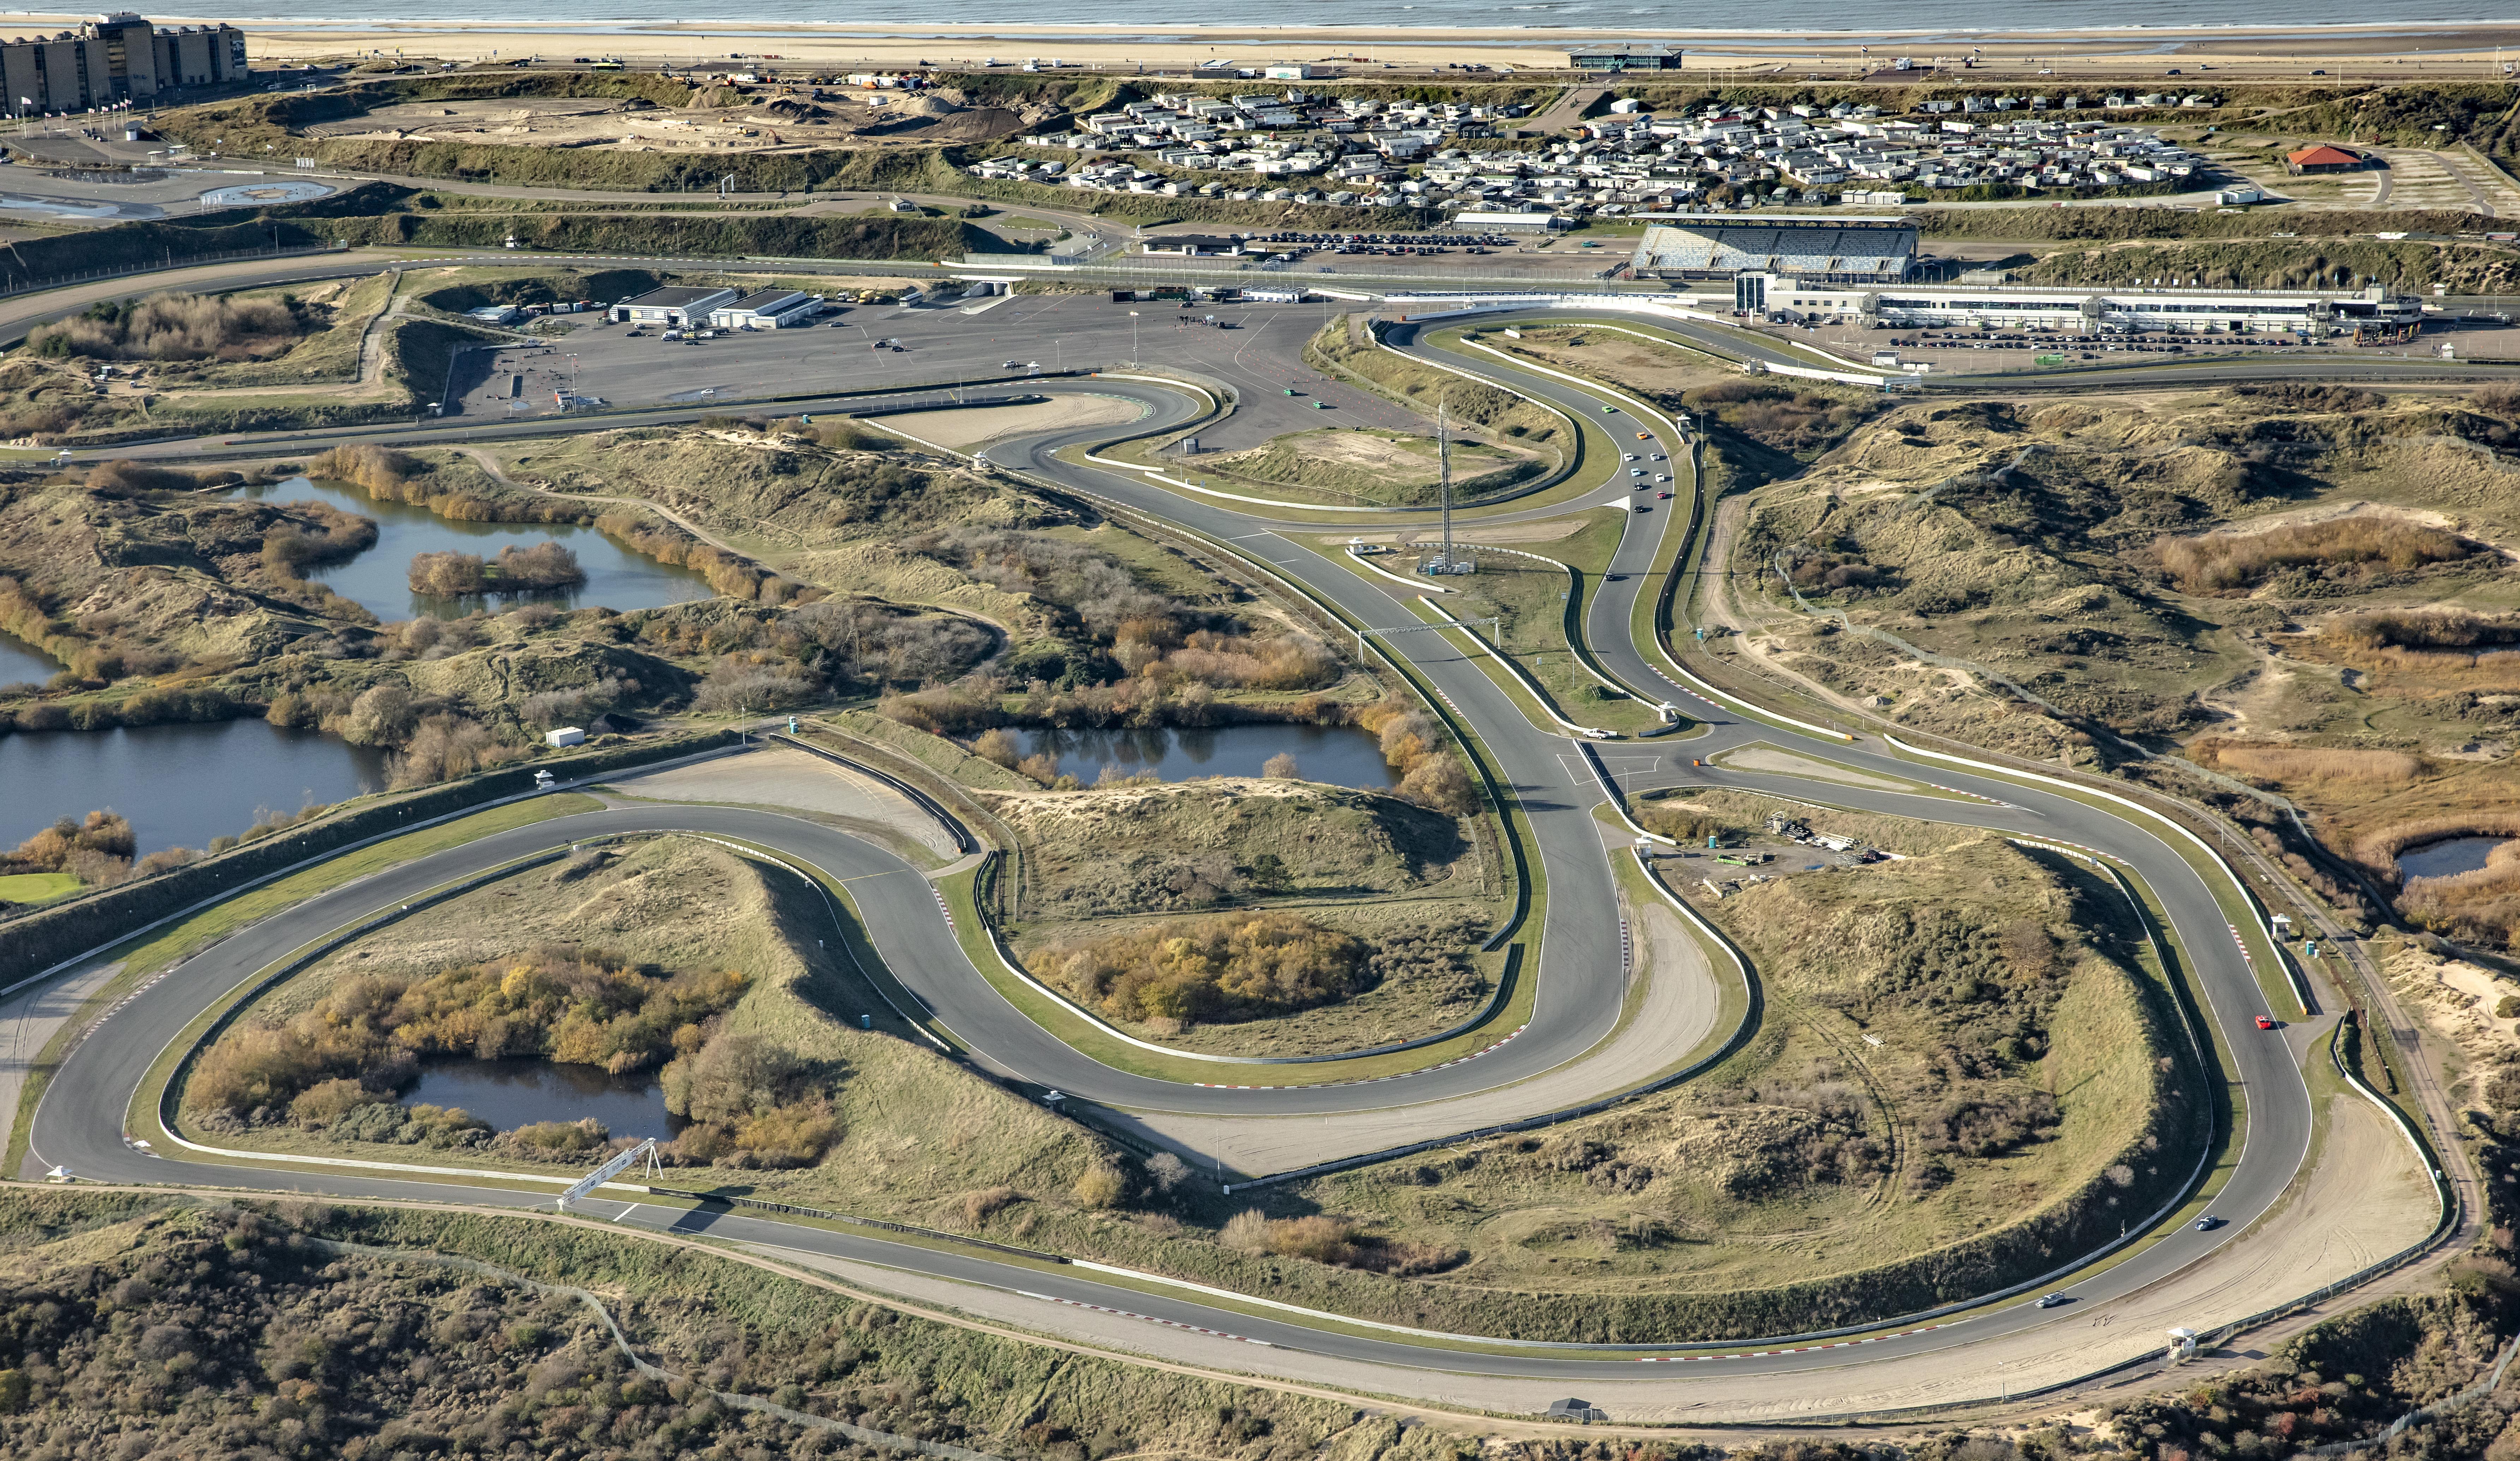 'Formule 1 telt 23 races in 2021, met Zandvoort na zomerpauze'